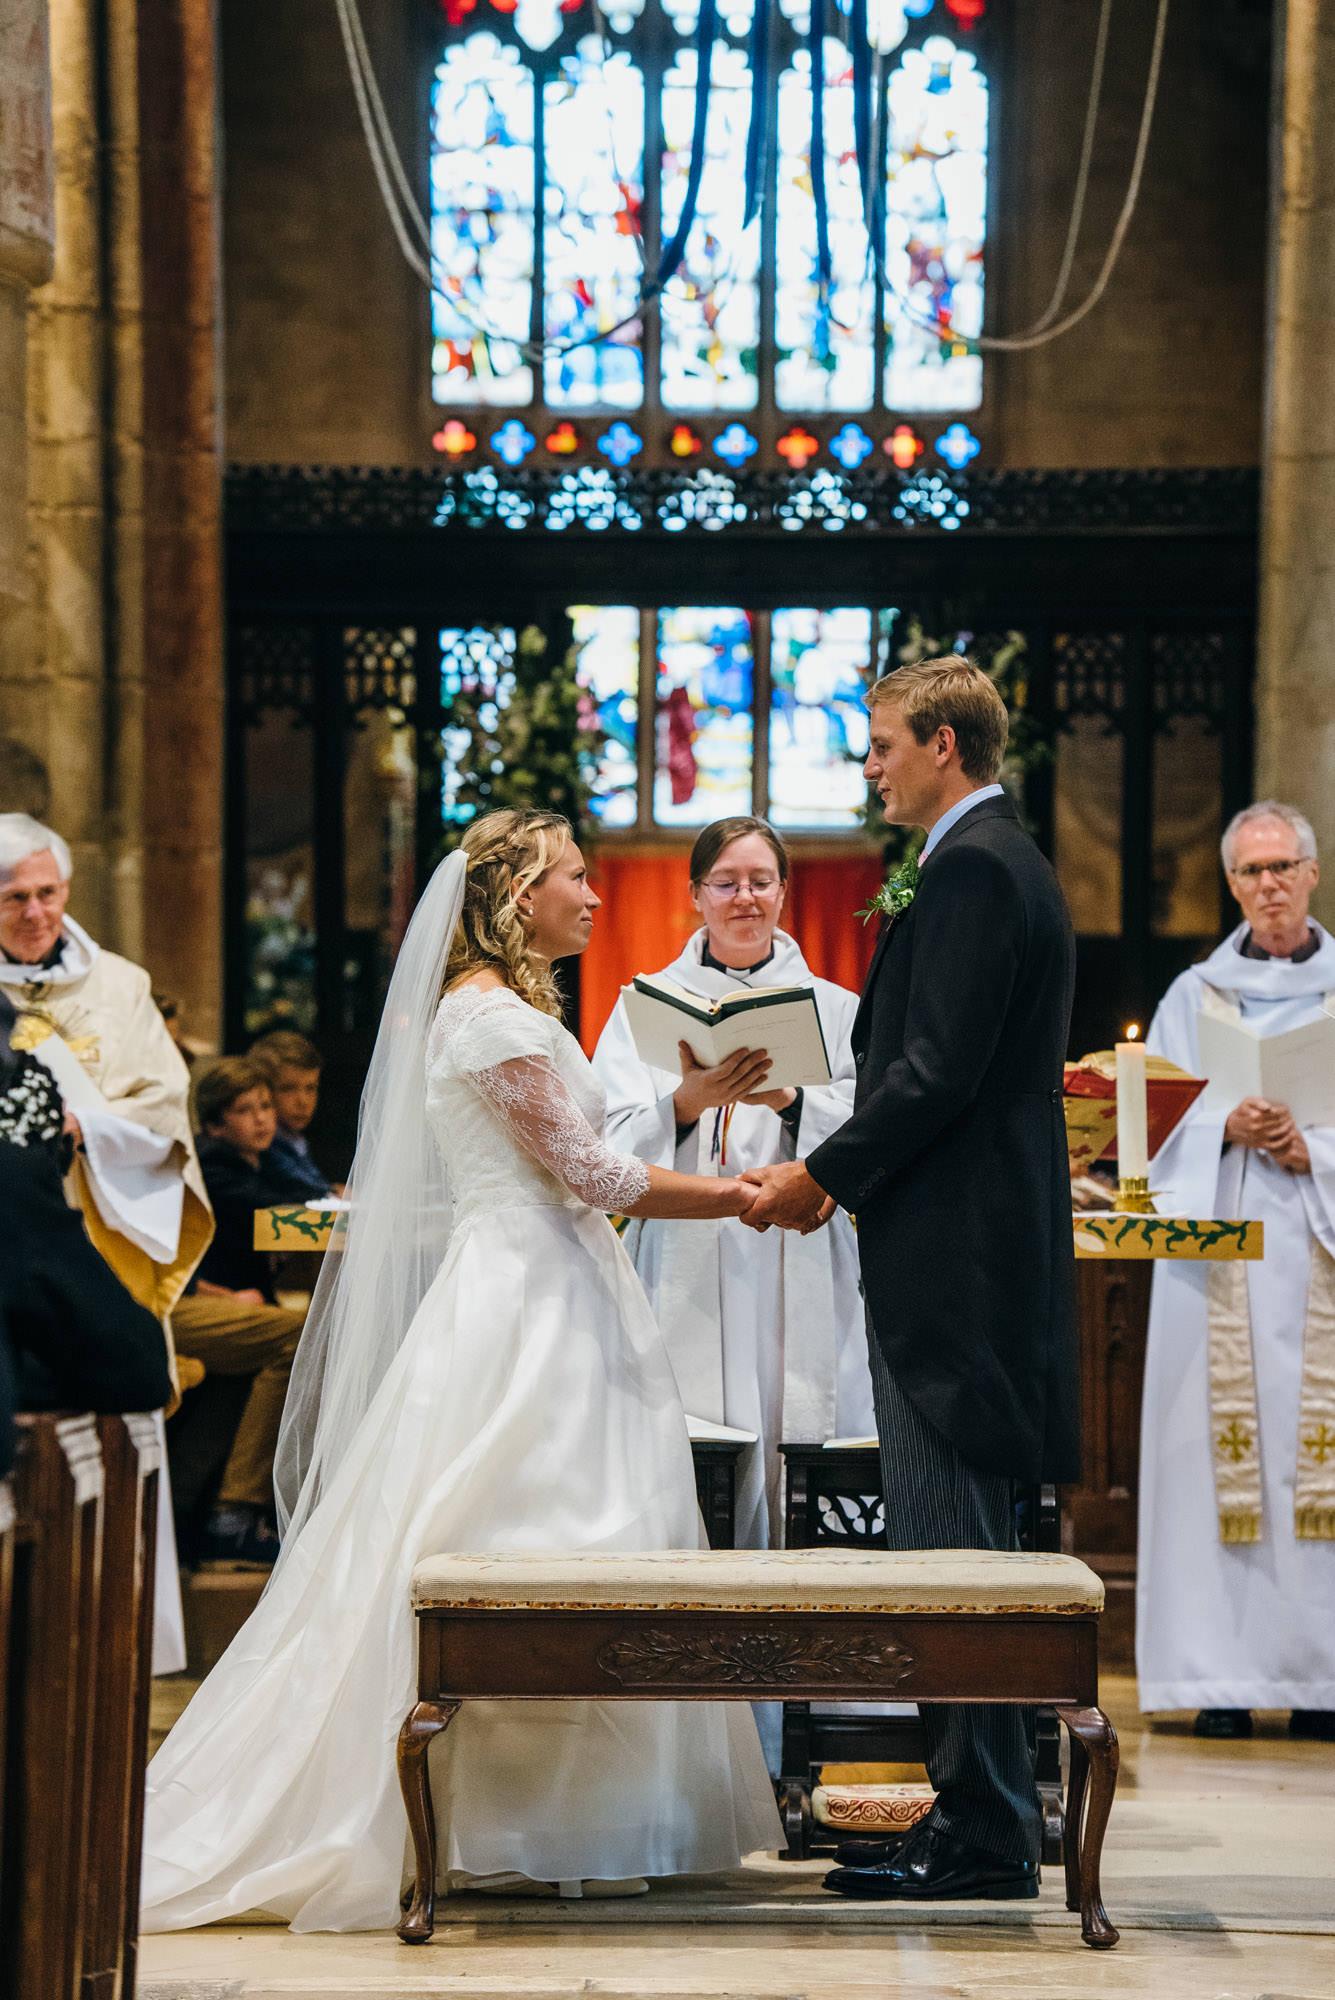 Cirencester wedding photography033